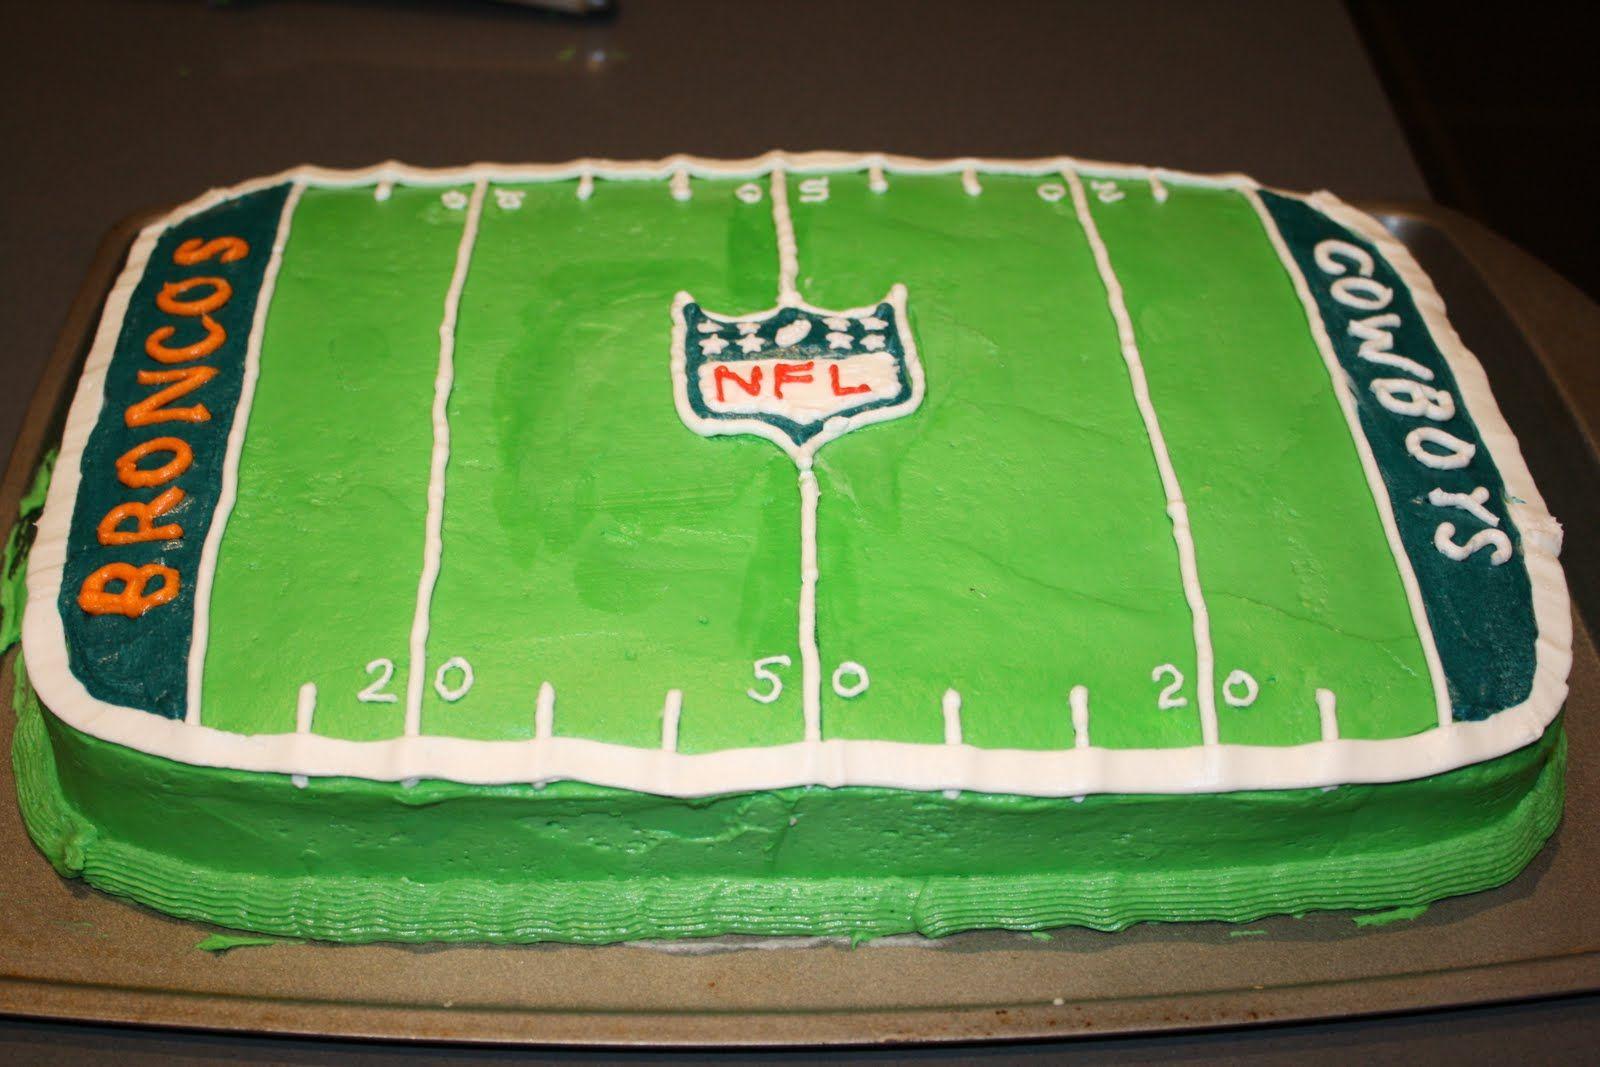 Cake Decorating Football Theme : Football Themed Birthday Cake and Cupcake Decorating Ideas ...